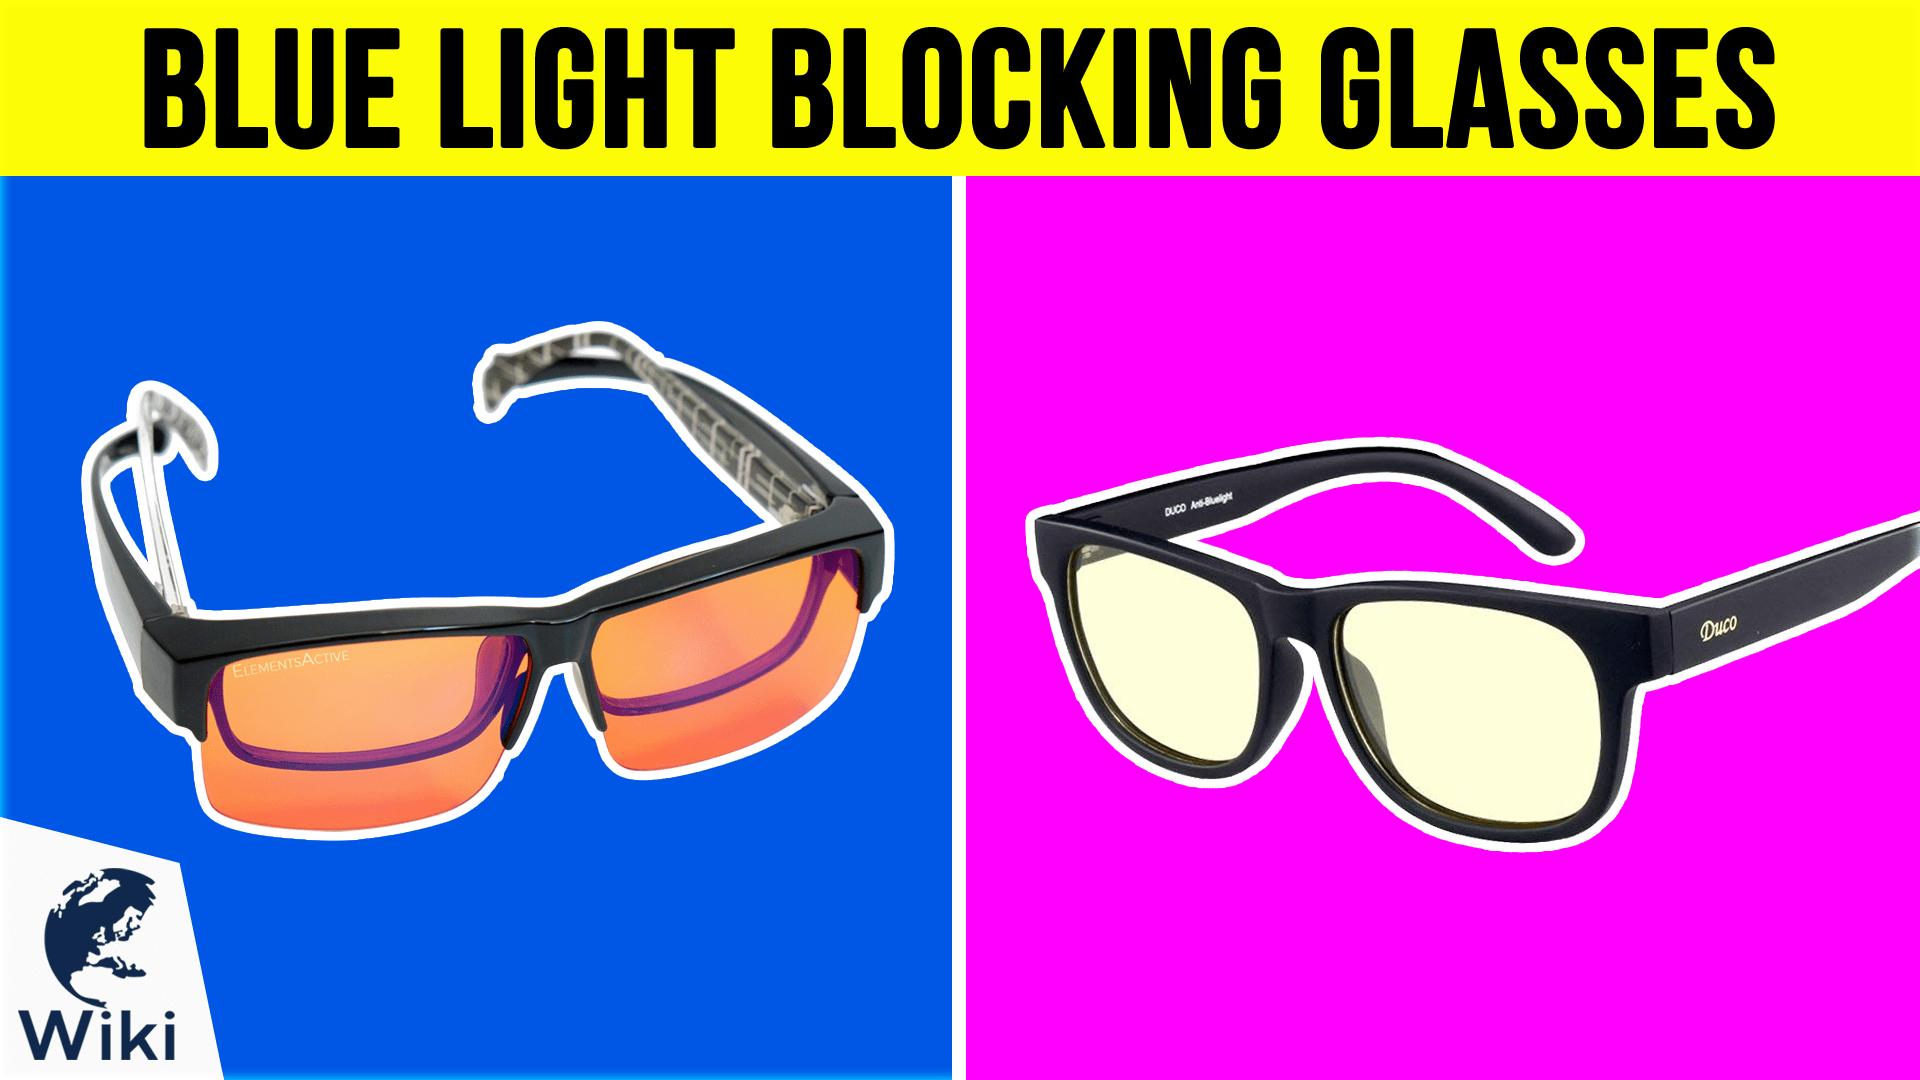 ZAM DER Retro Style Sunglasses,Light Plastic Glasses,Anti-Uv,Anti-Blue Light,Polarized